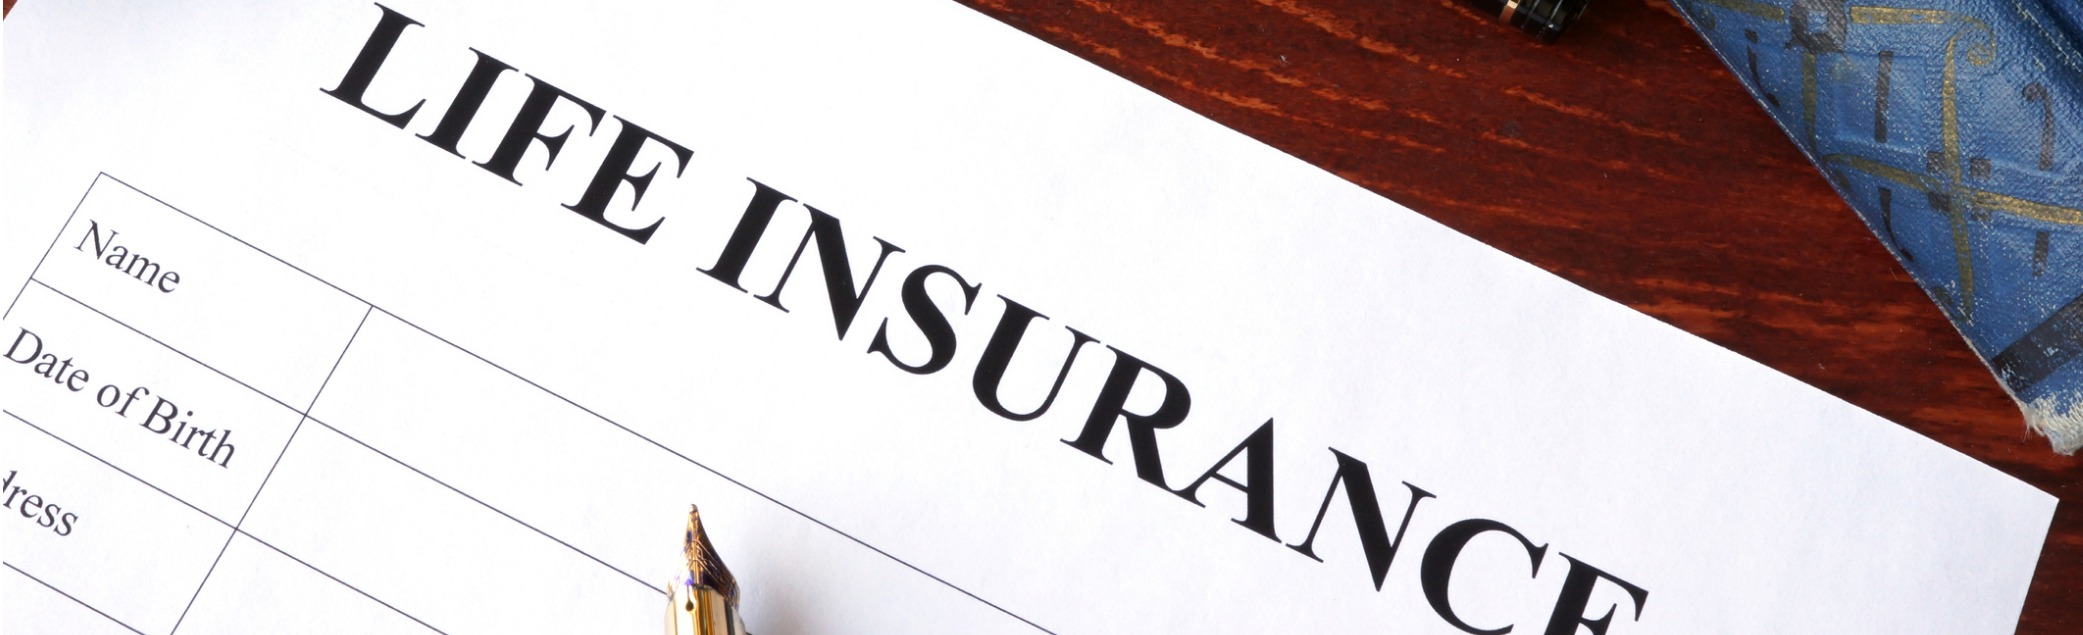 life insurance refund large.jpg